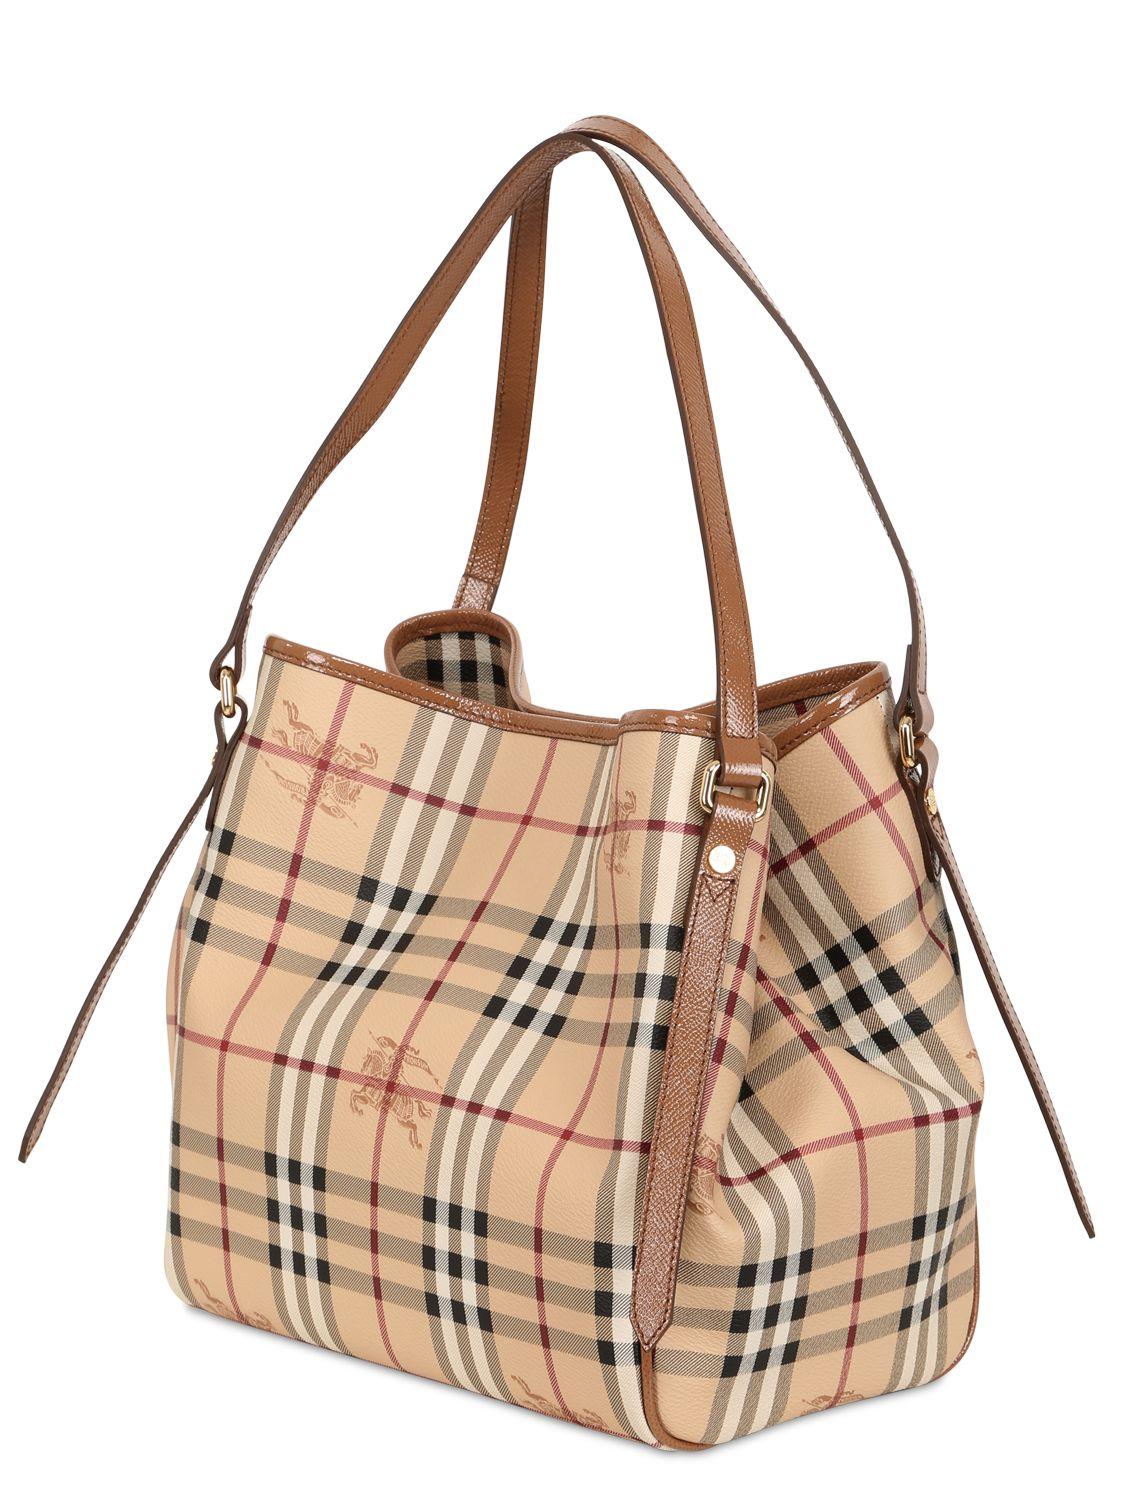 3f144f9c96e1 Lyst - Burberry Small Canterbury Haymarket Bag in Brown